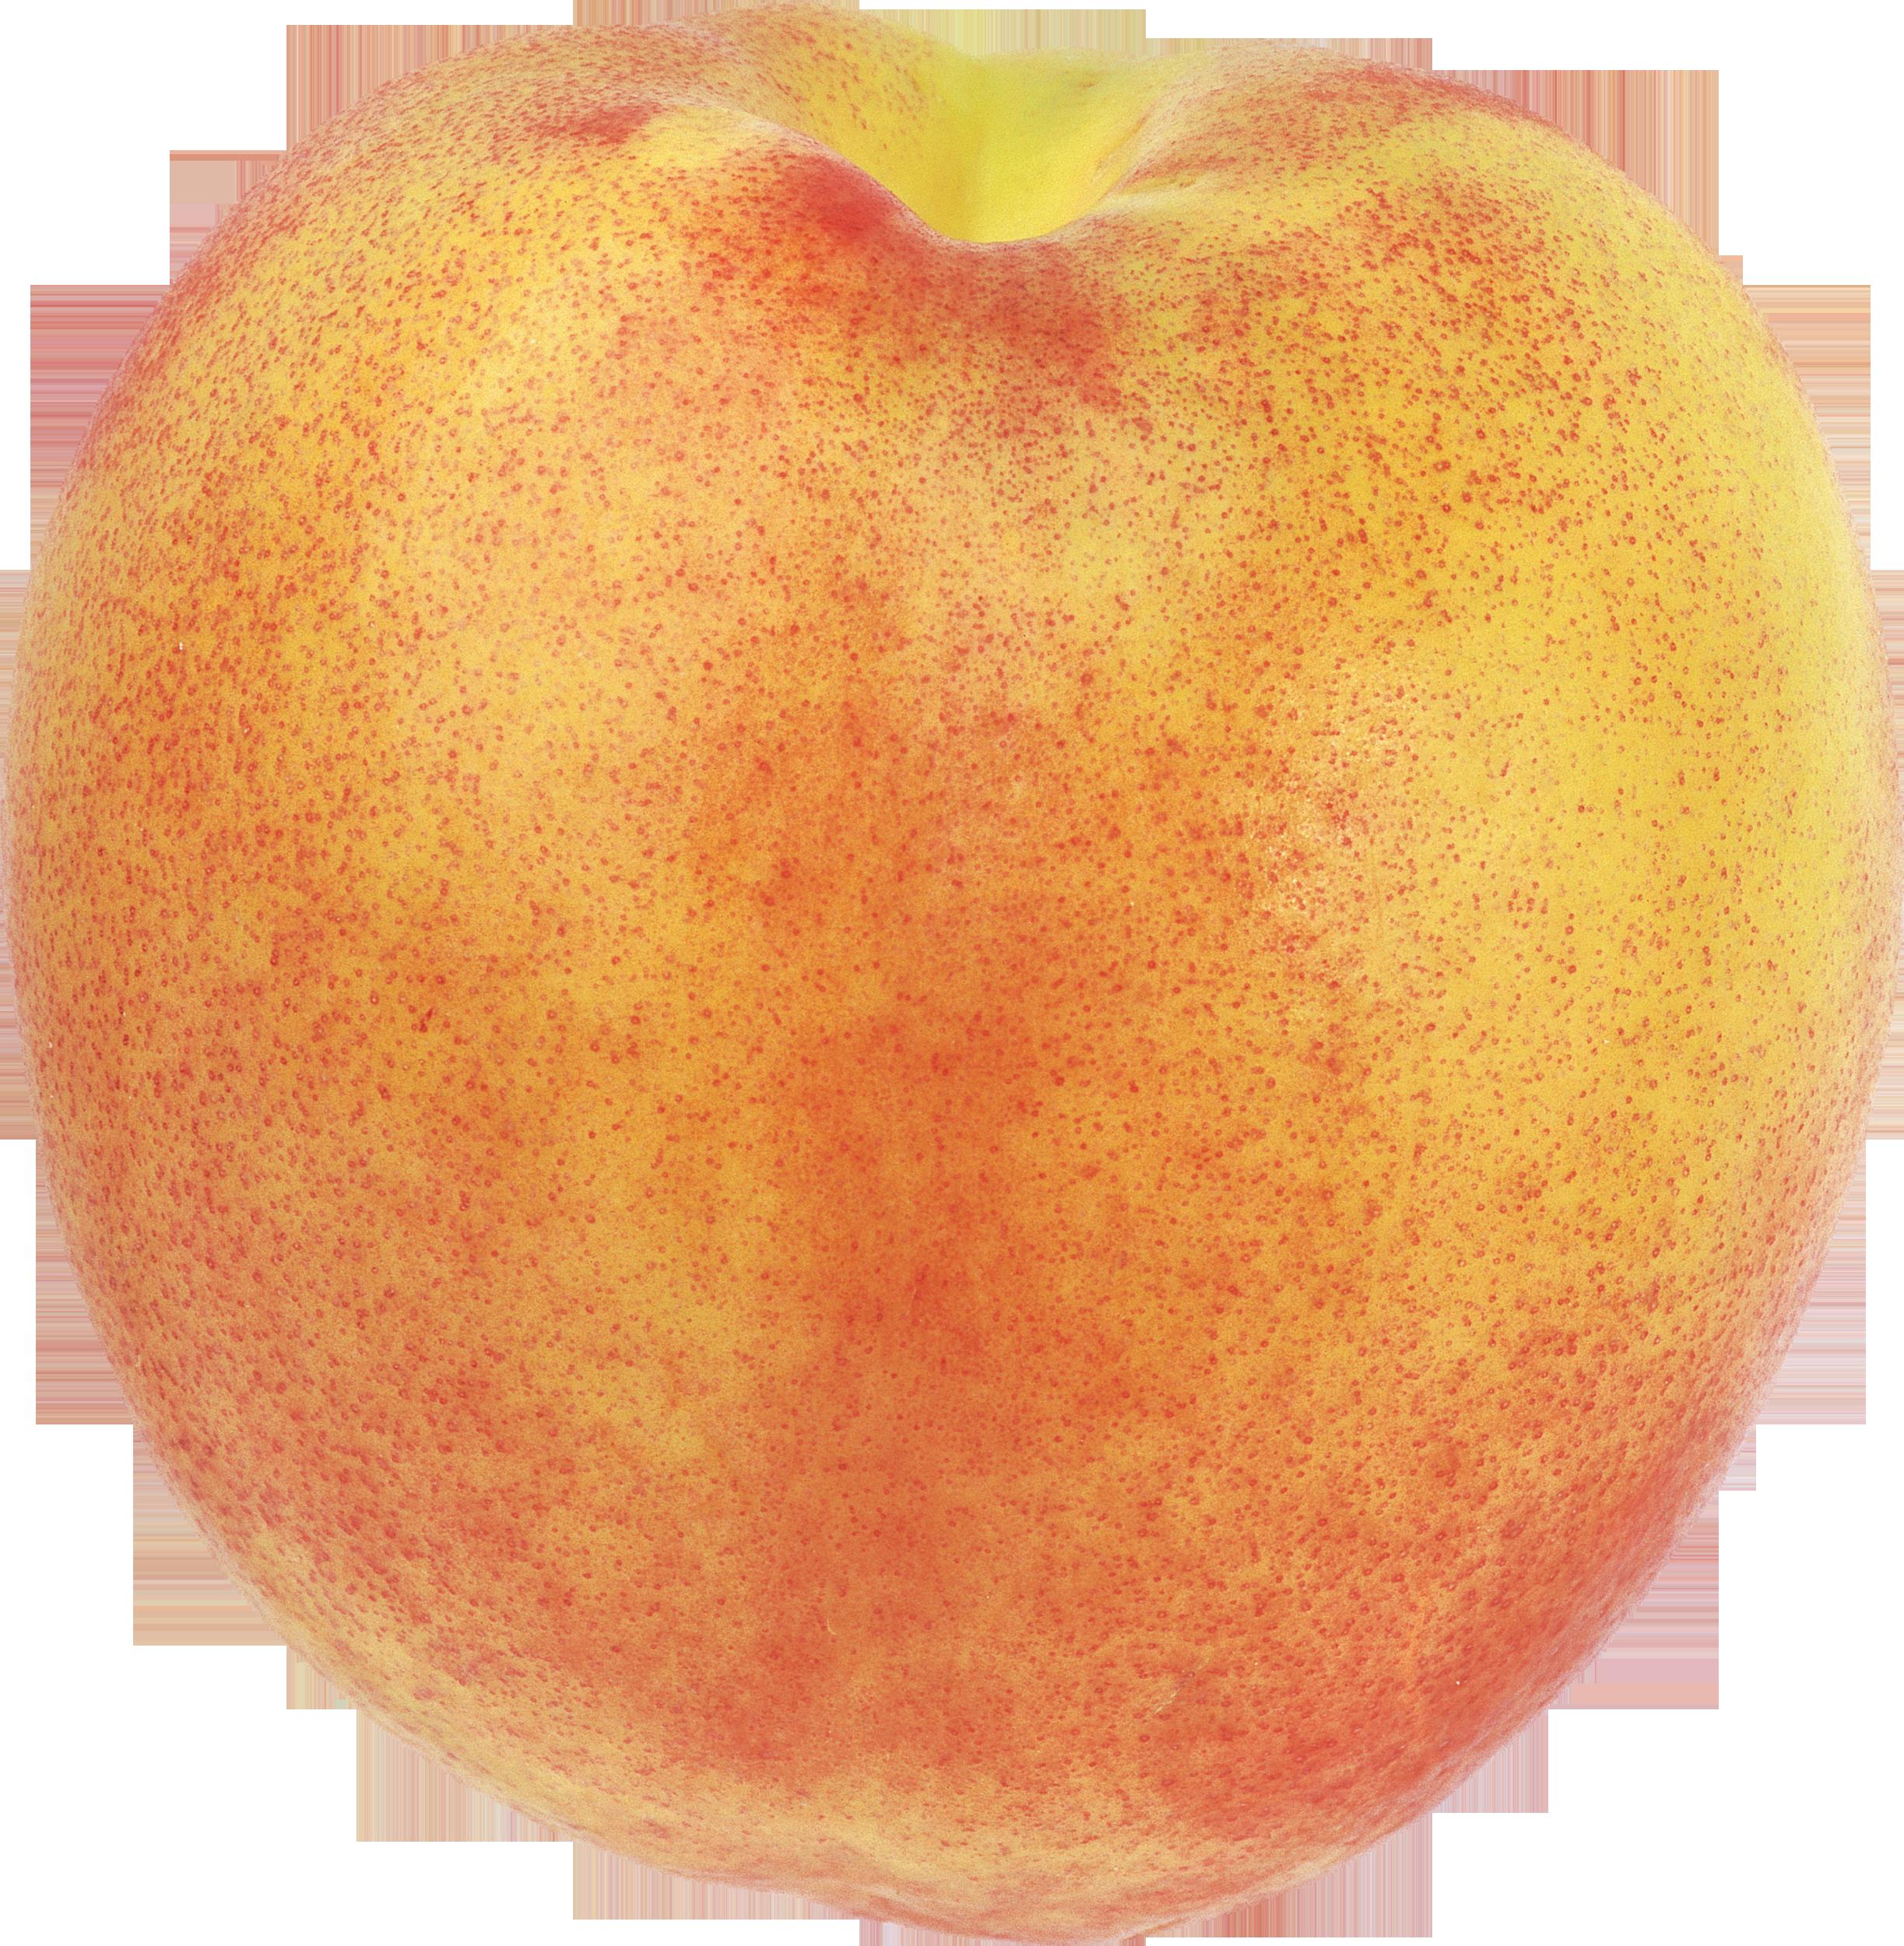 Peach four isolated stock. Peaches clipart outline